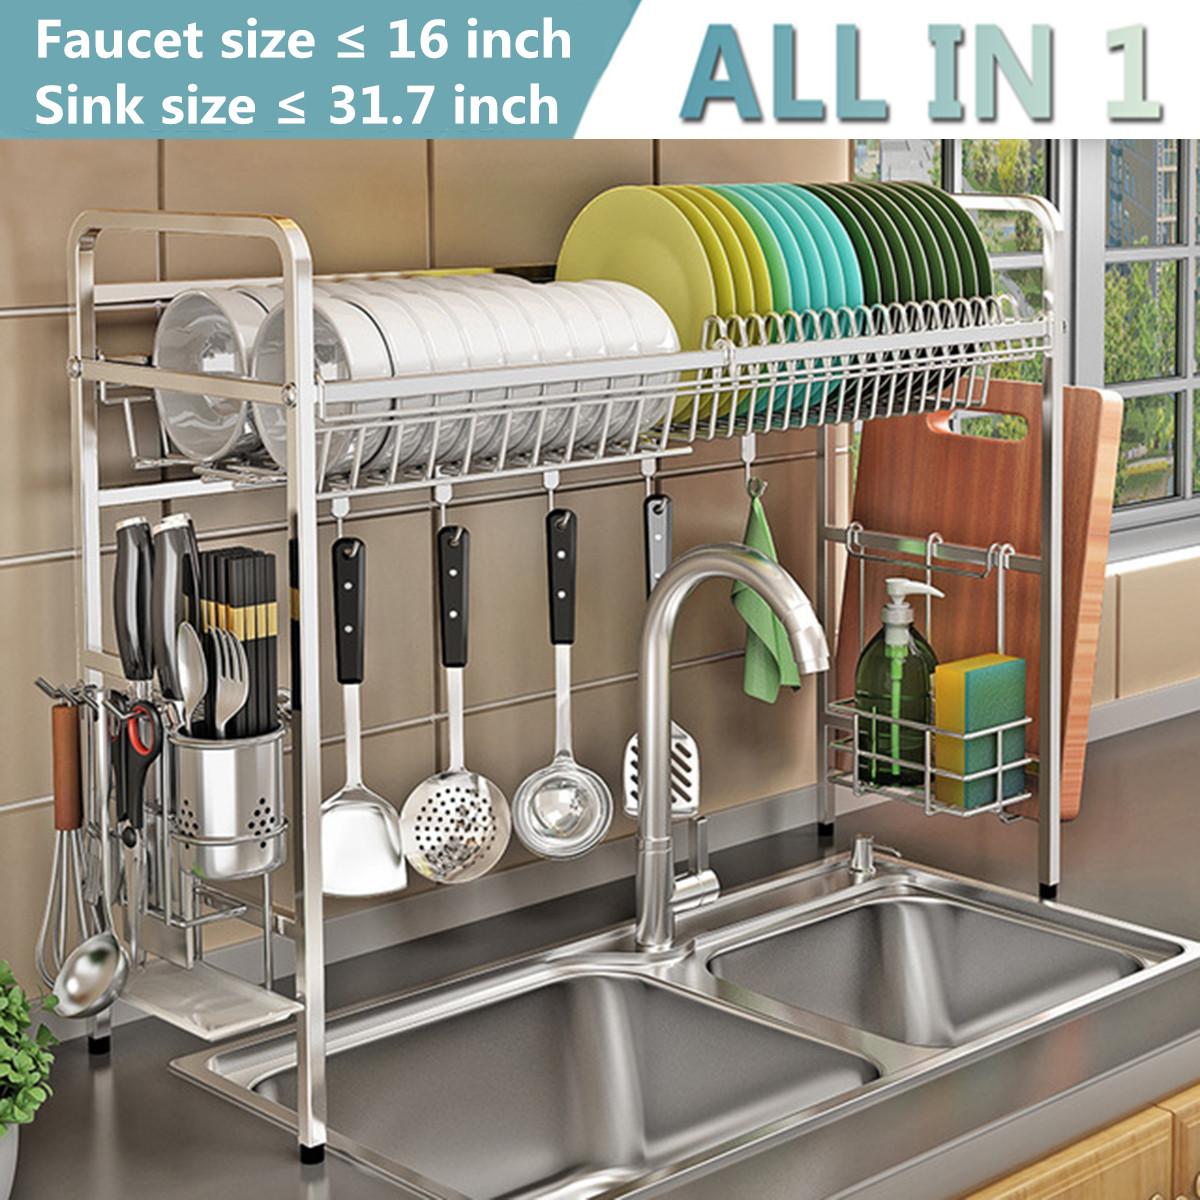 Dish Rack Drying Kitchen Steel Stainless Drainer Holder Sink Shelf Over Storage